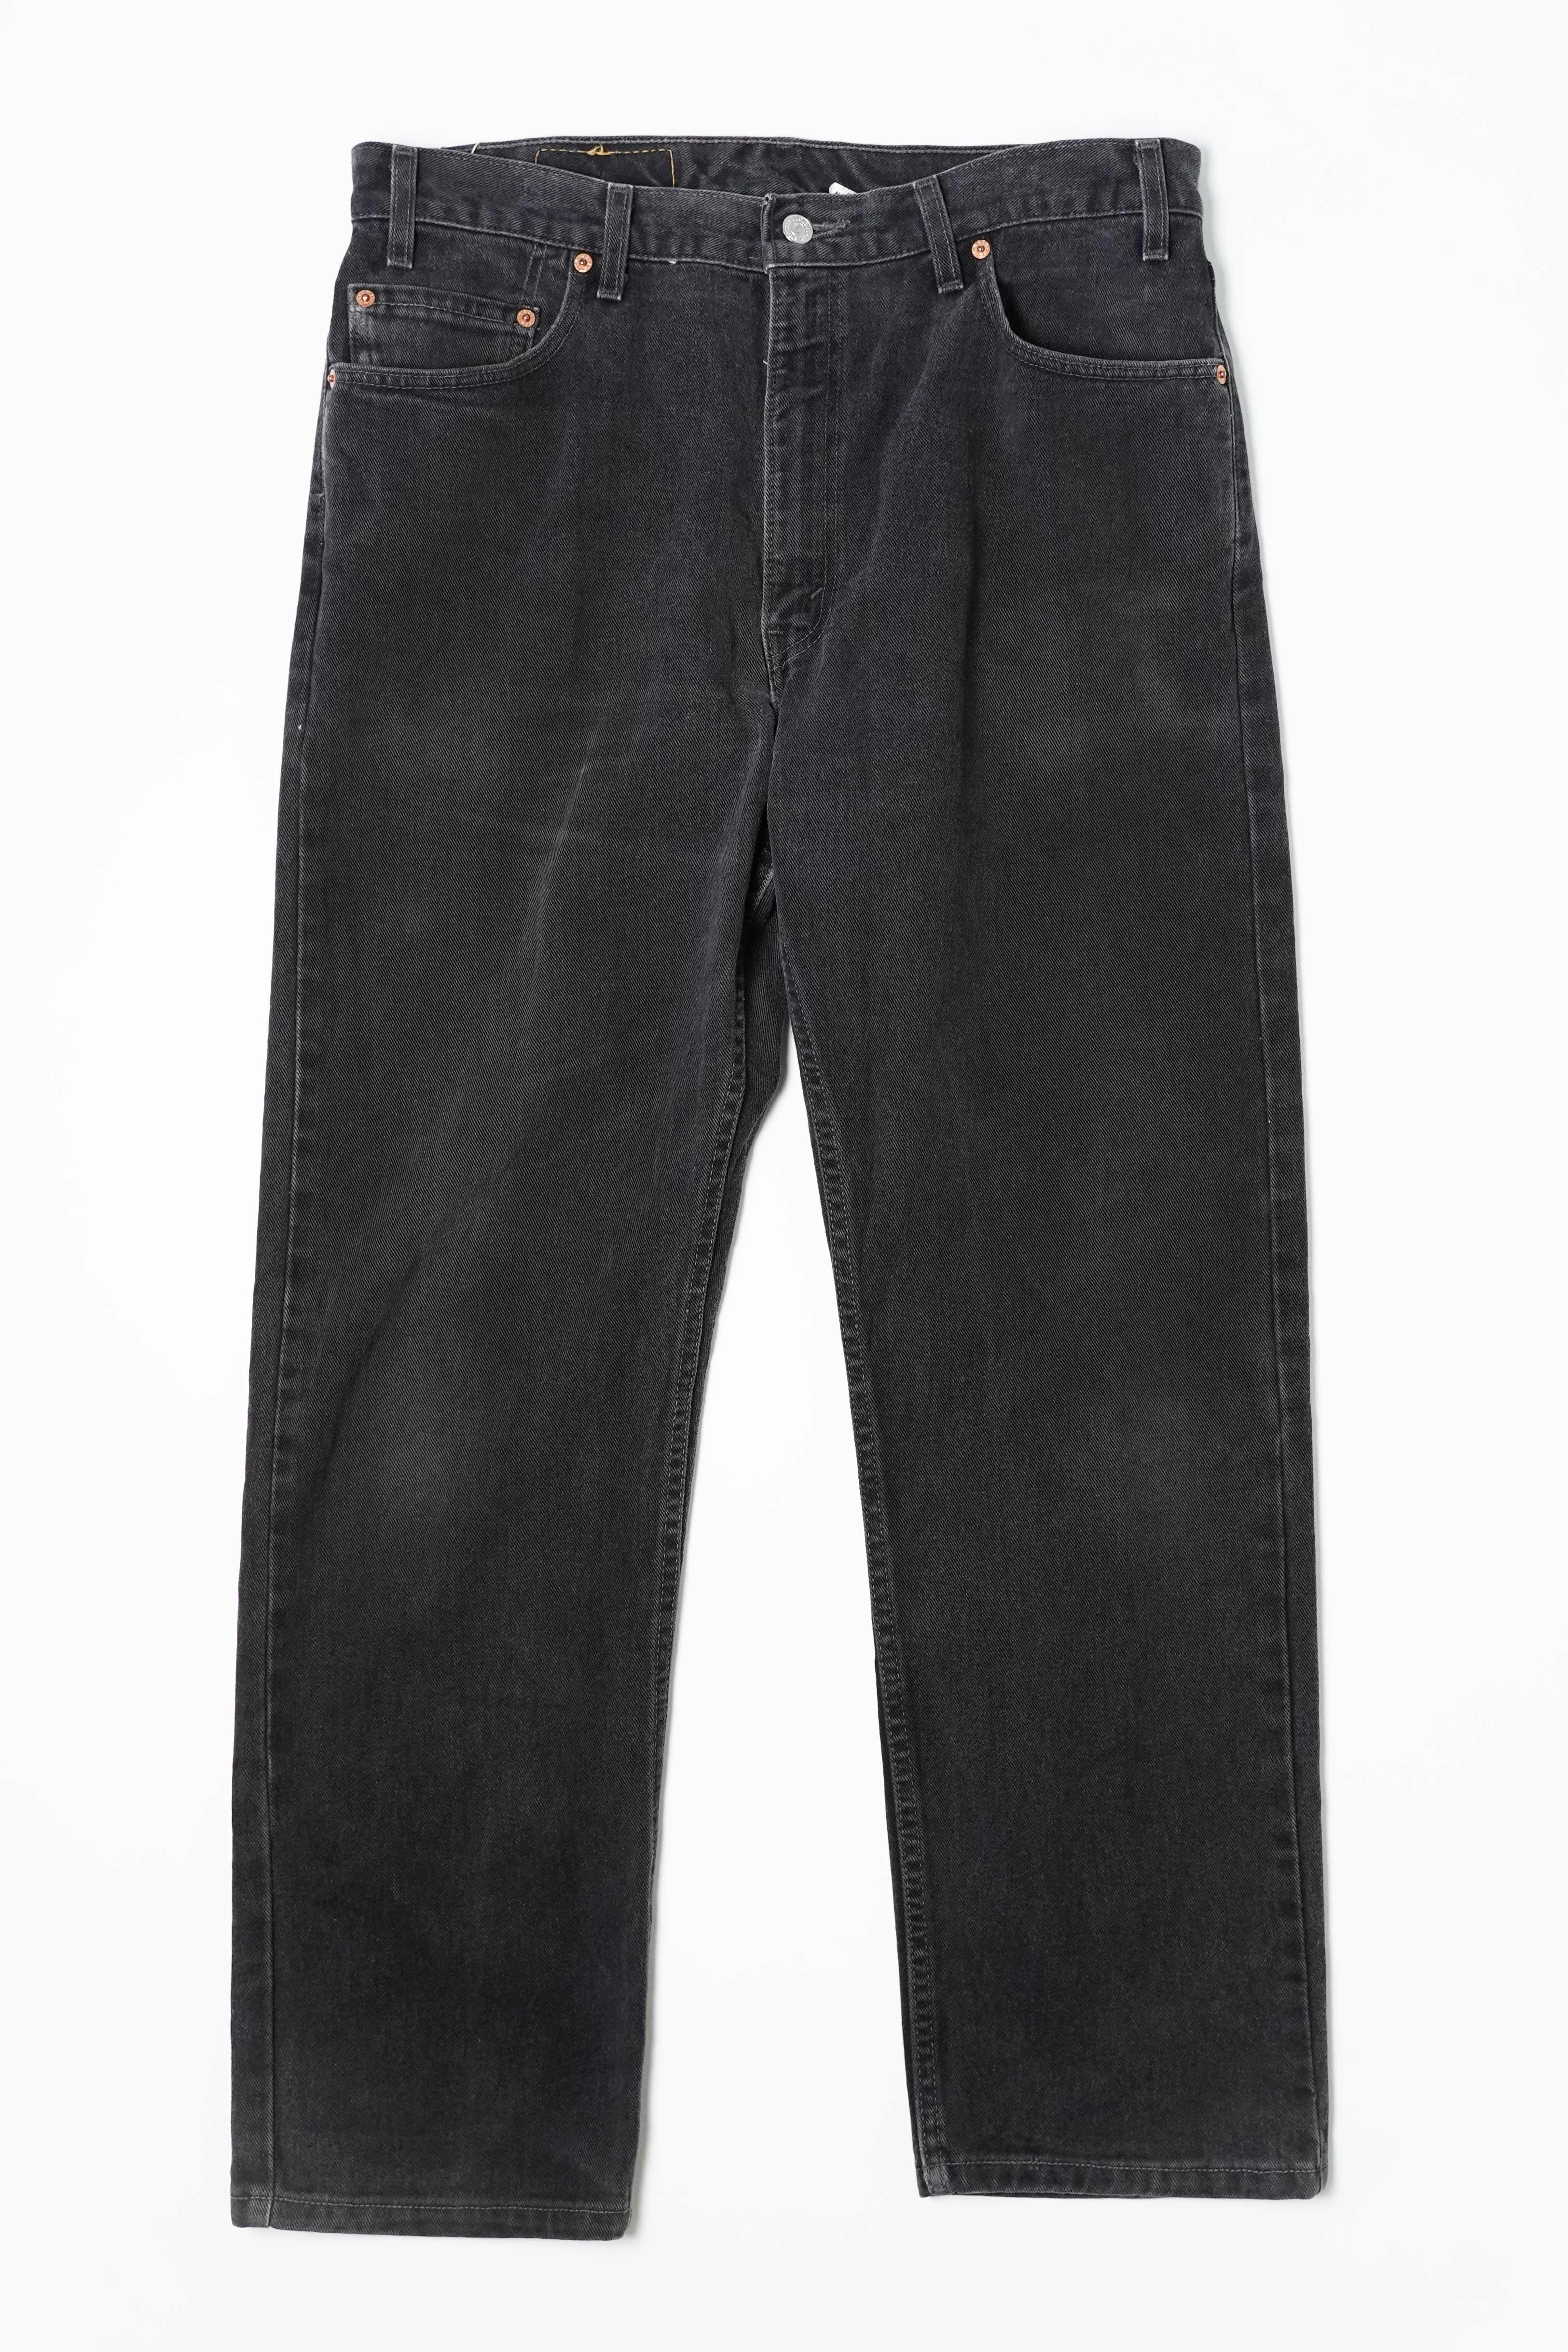 LEVI'S 505 W36 L30 BLACK DENIM PANTS